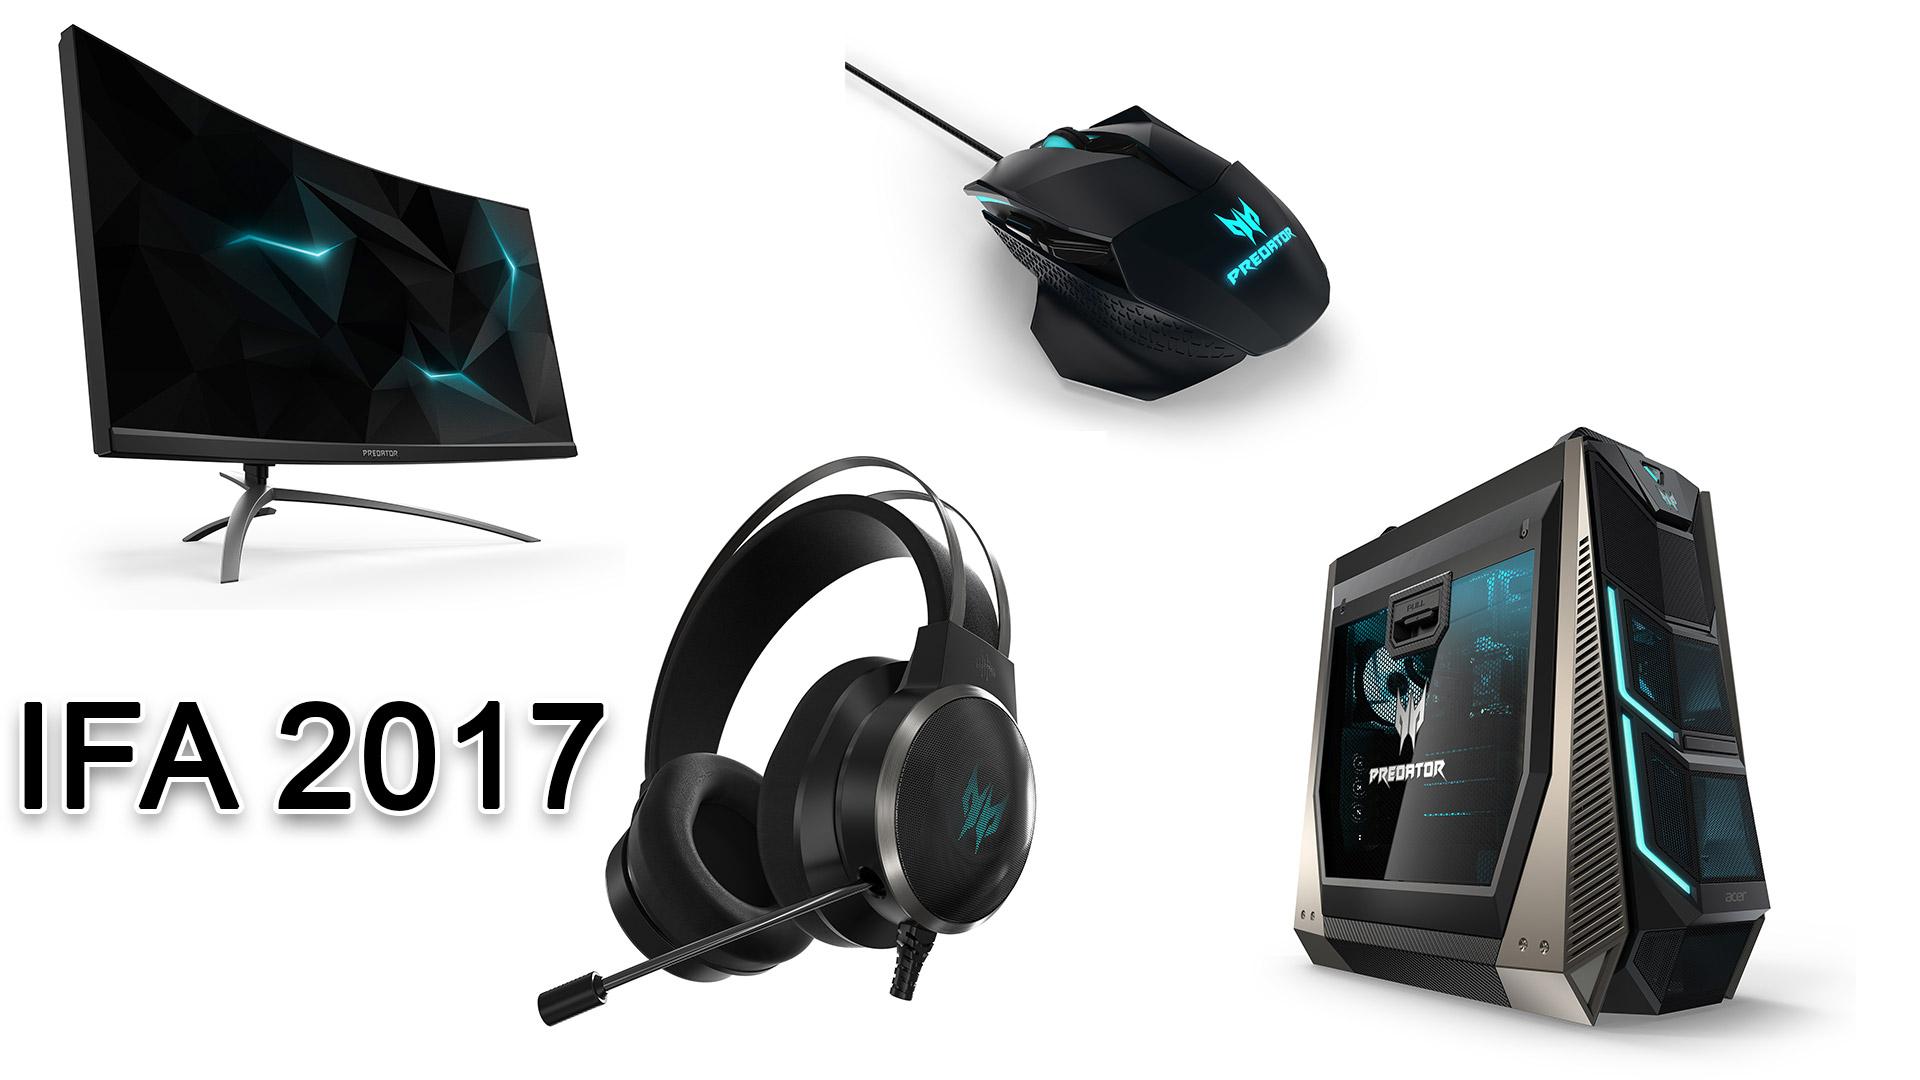 IFA 2017] Acer Announces the Predator Orion 9000 desktop, Predator